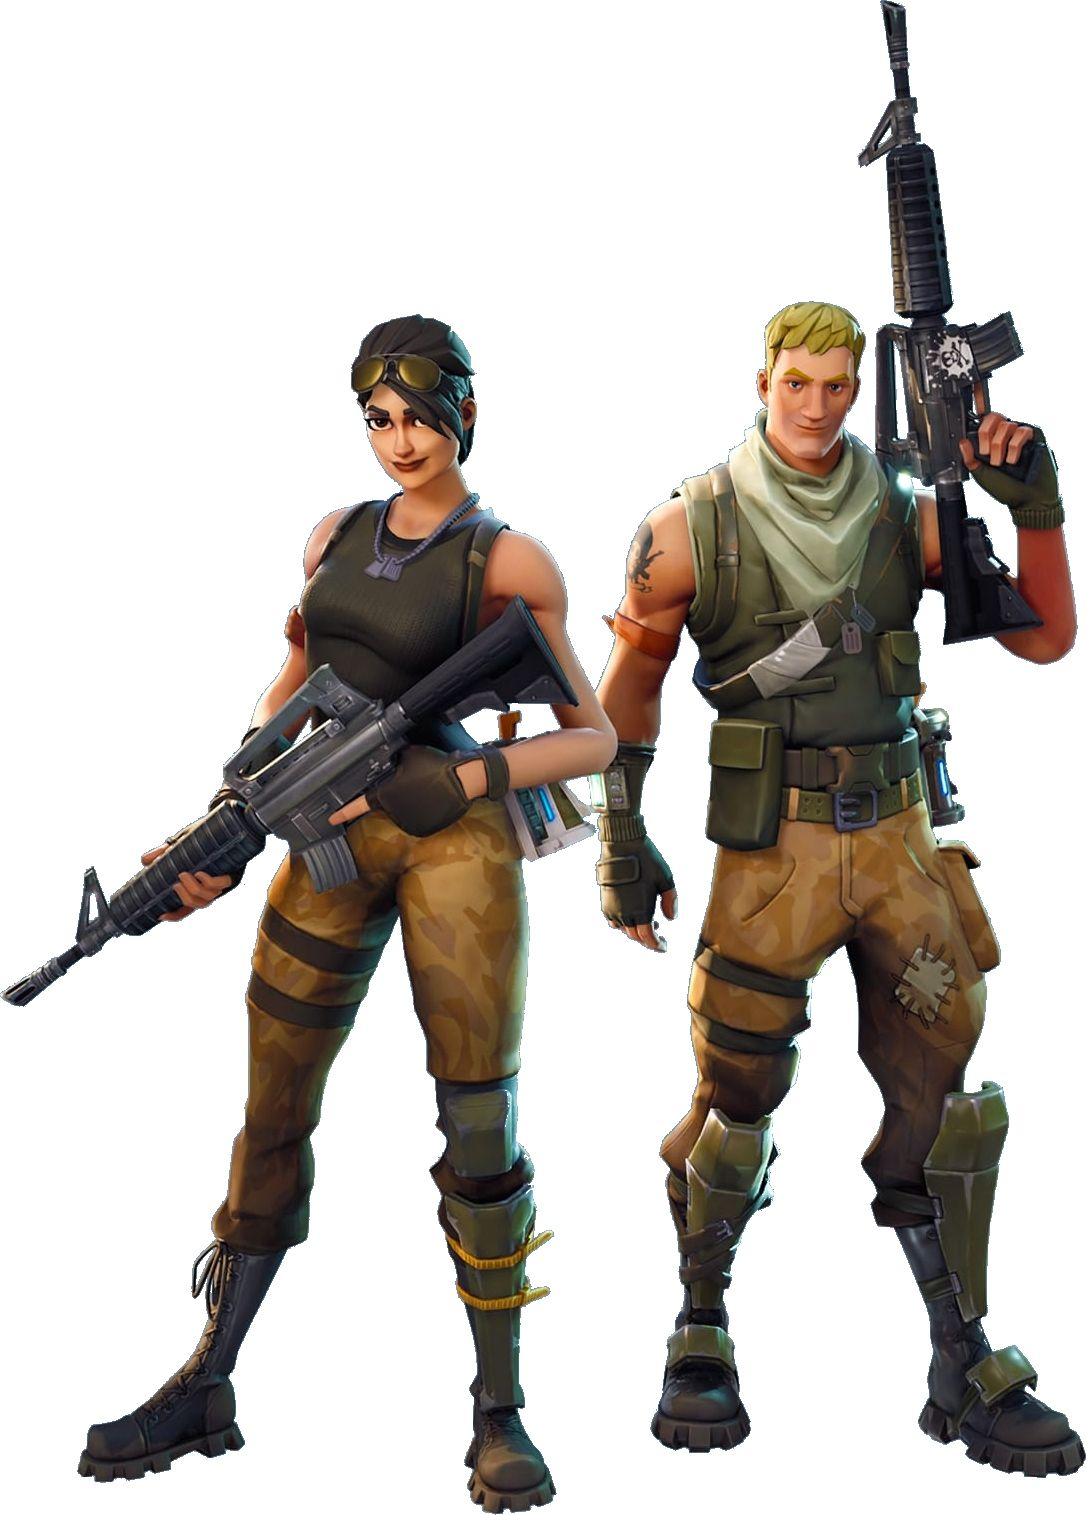 Default Skin Fortnite Jonesy Soldier Fortnite Wiki Fortnite Skin Images Xbox One Skin